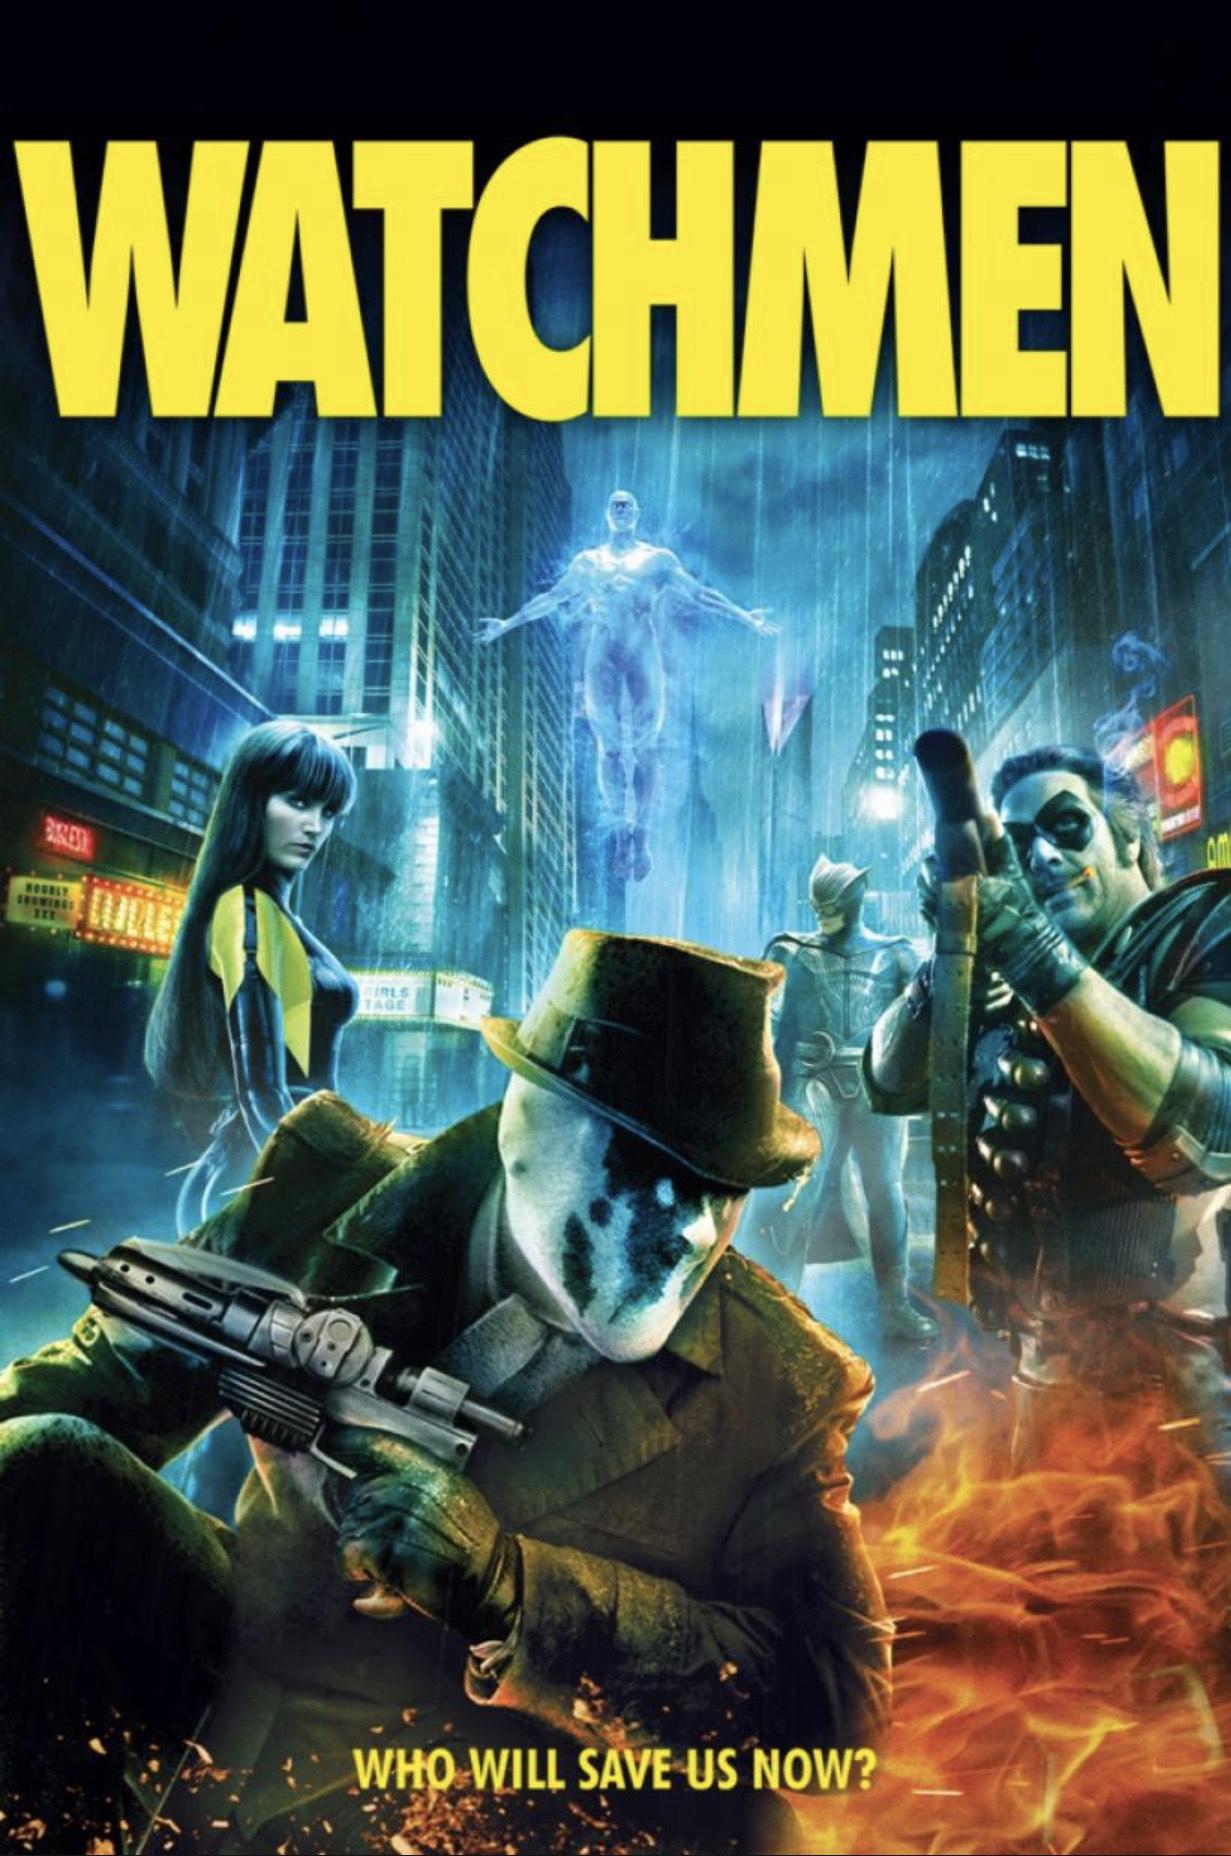 Watchmen The Ultimate Cut 4KDV £4.99 @ iTunes